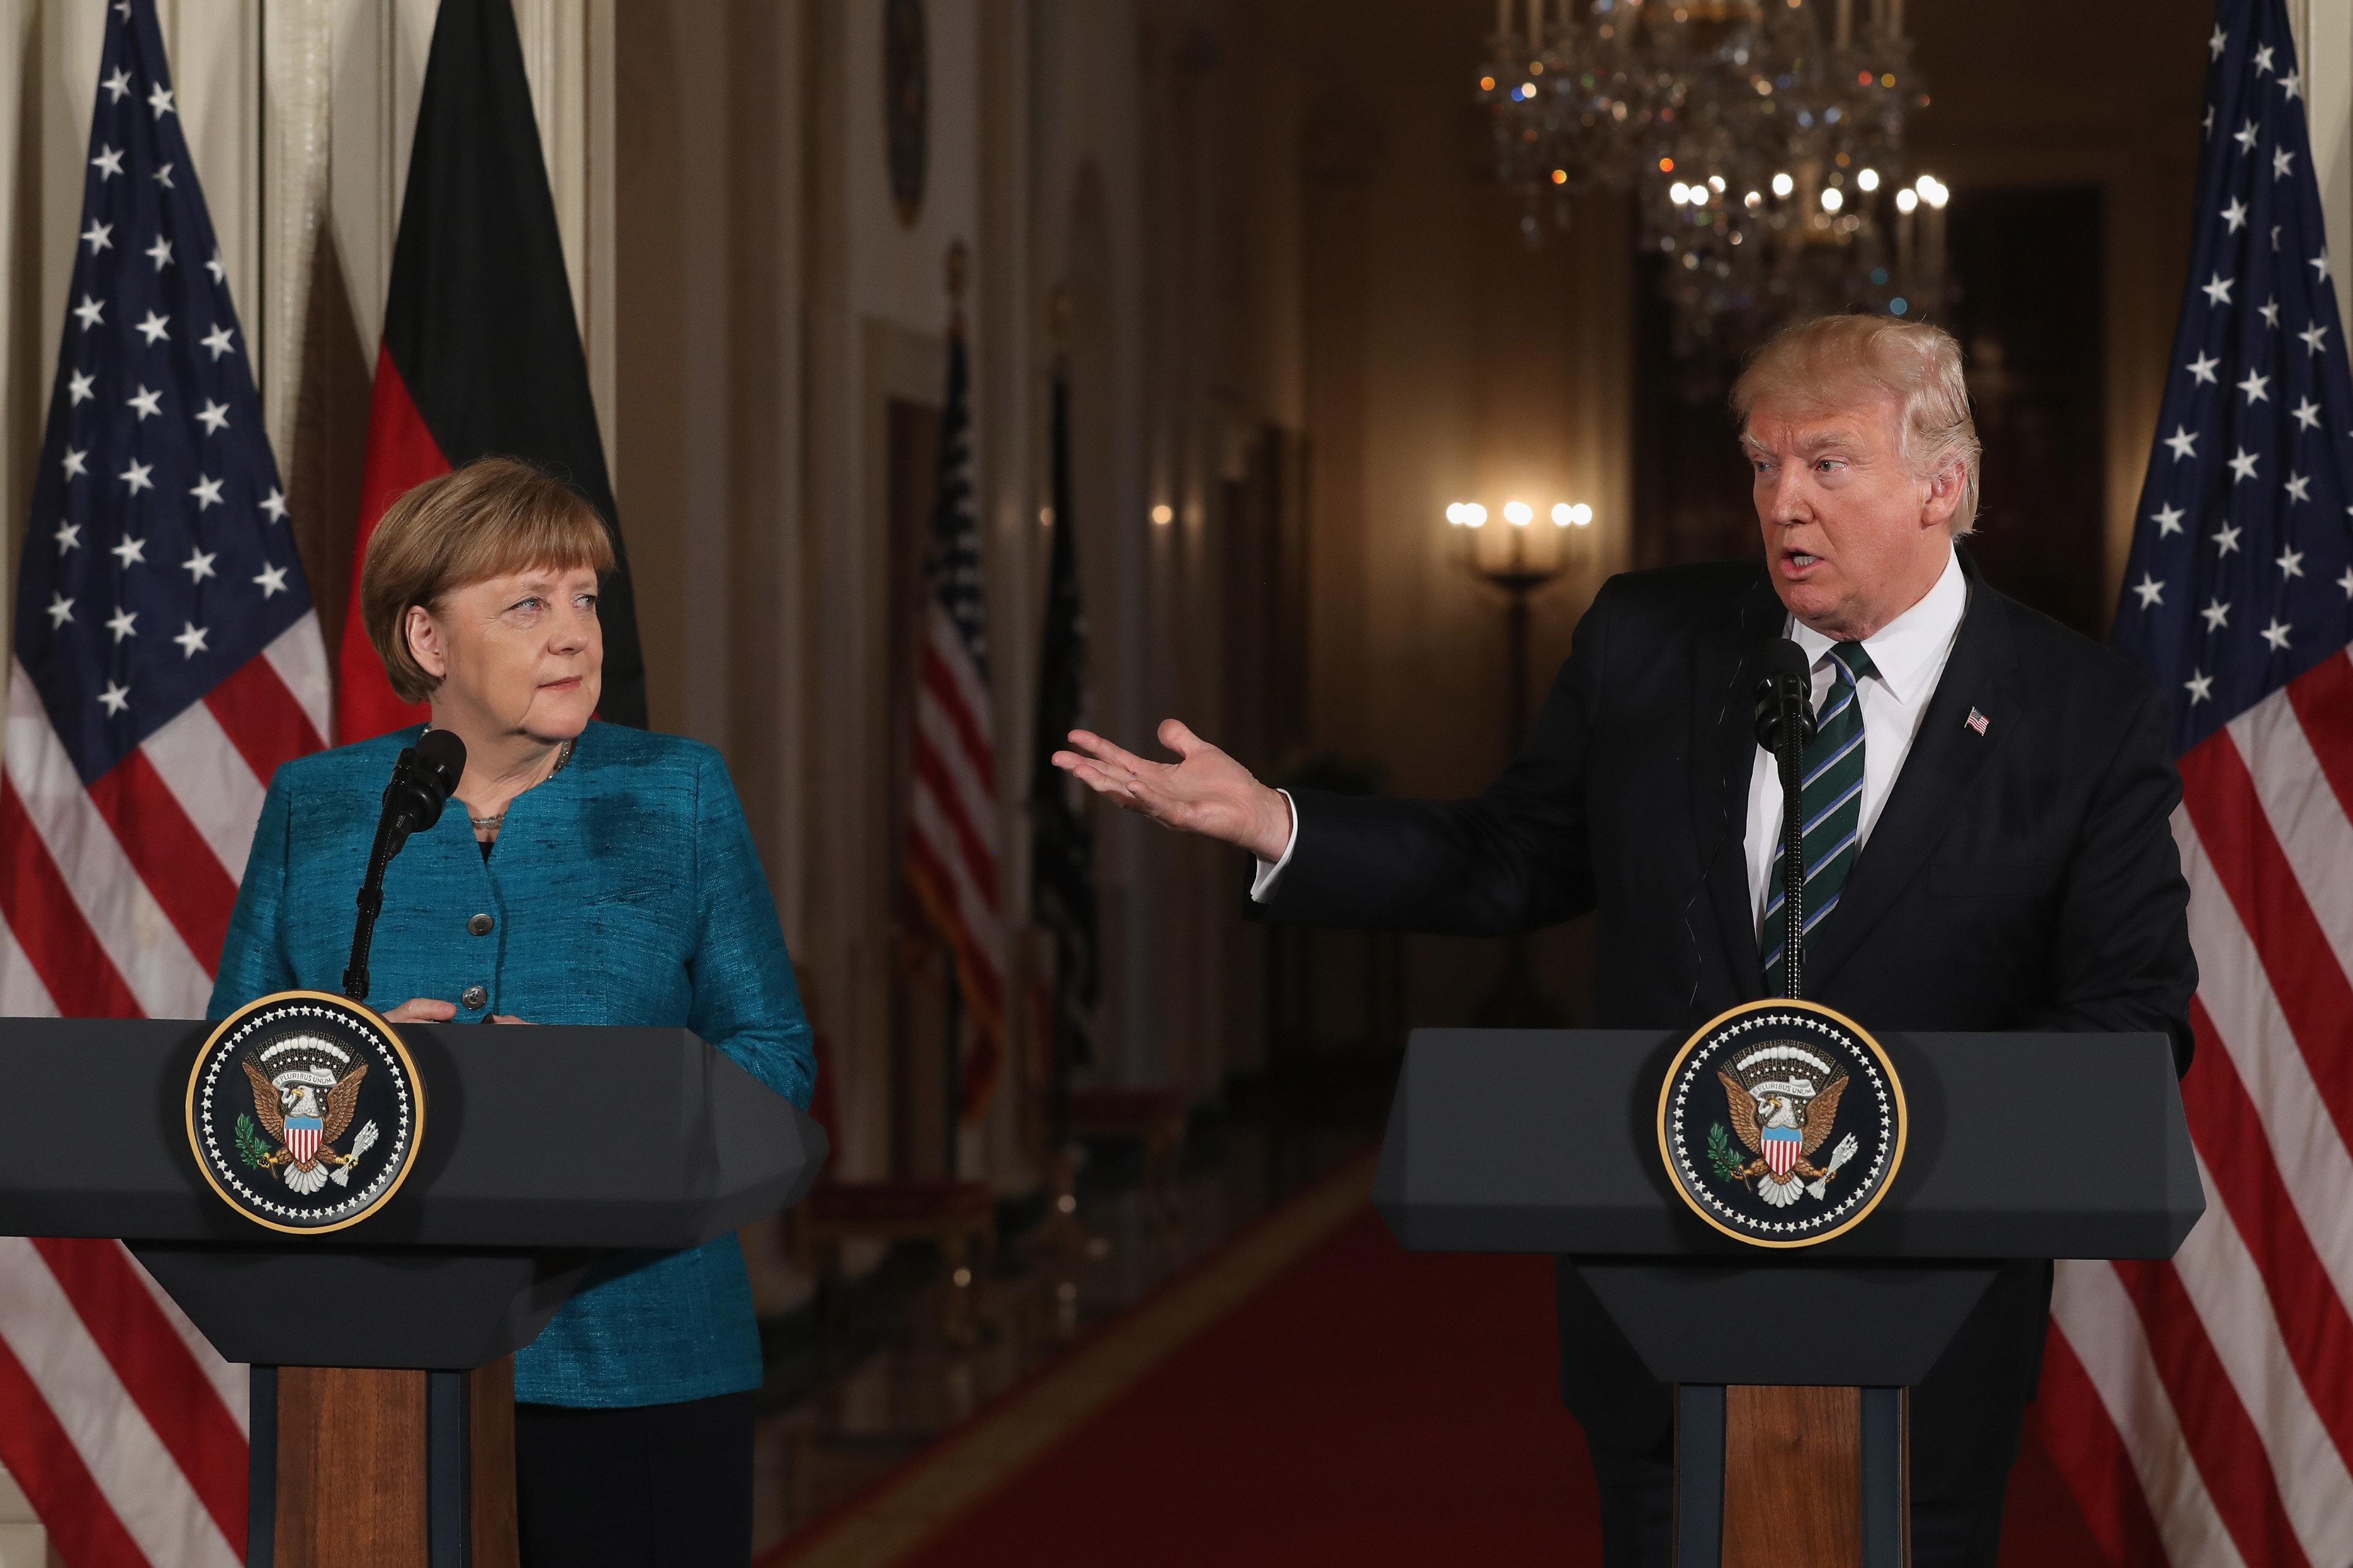 Donald Trump Angela Merkel Press Conference Results In ...